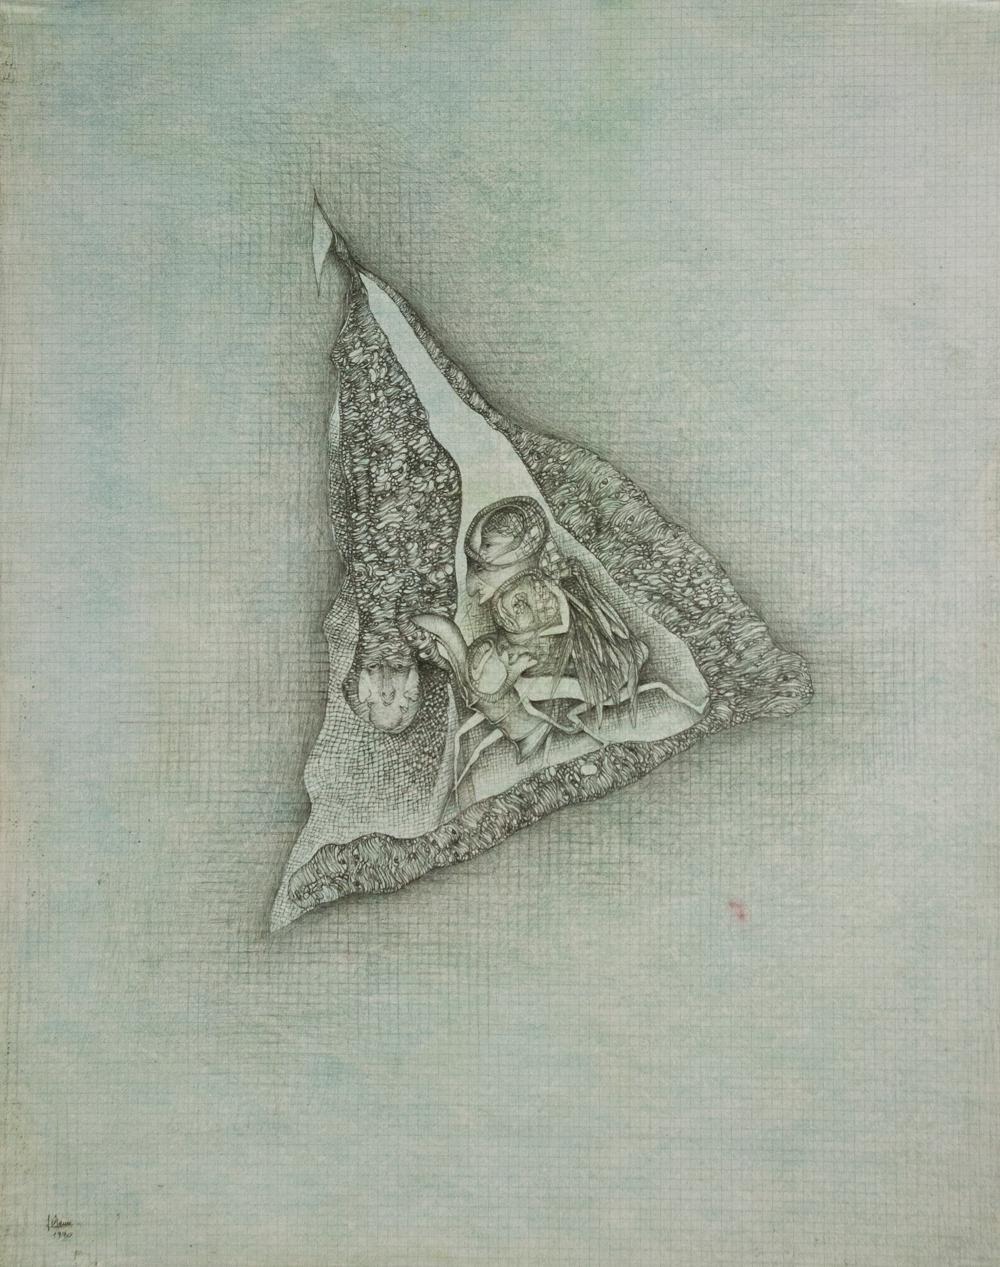 L'essence, crayon (51 x 65 cm)